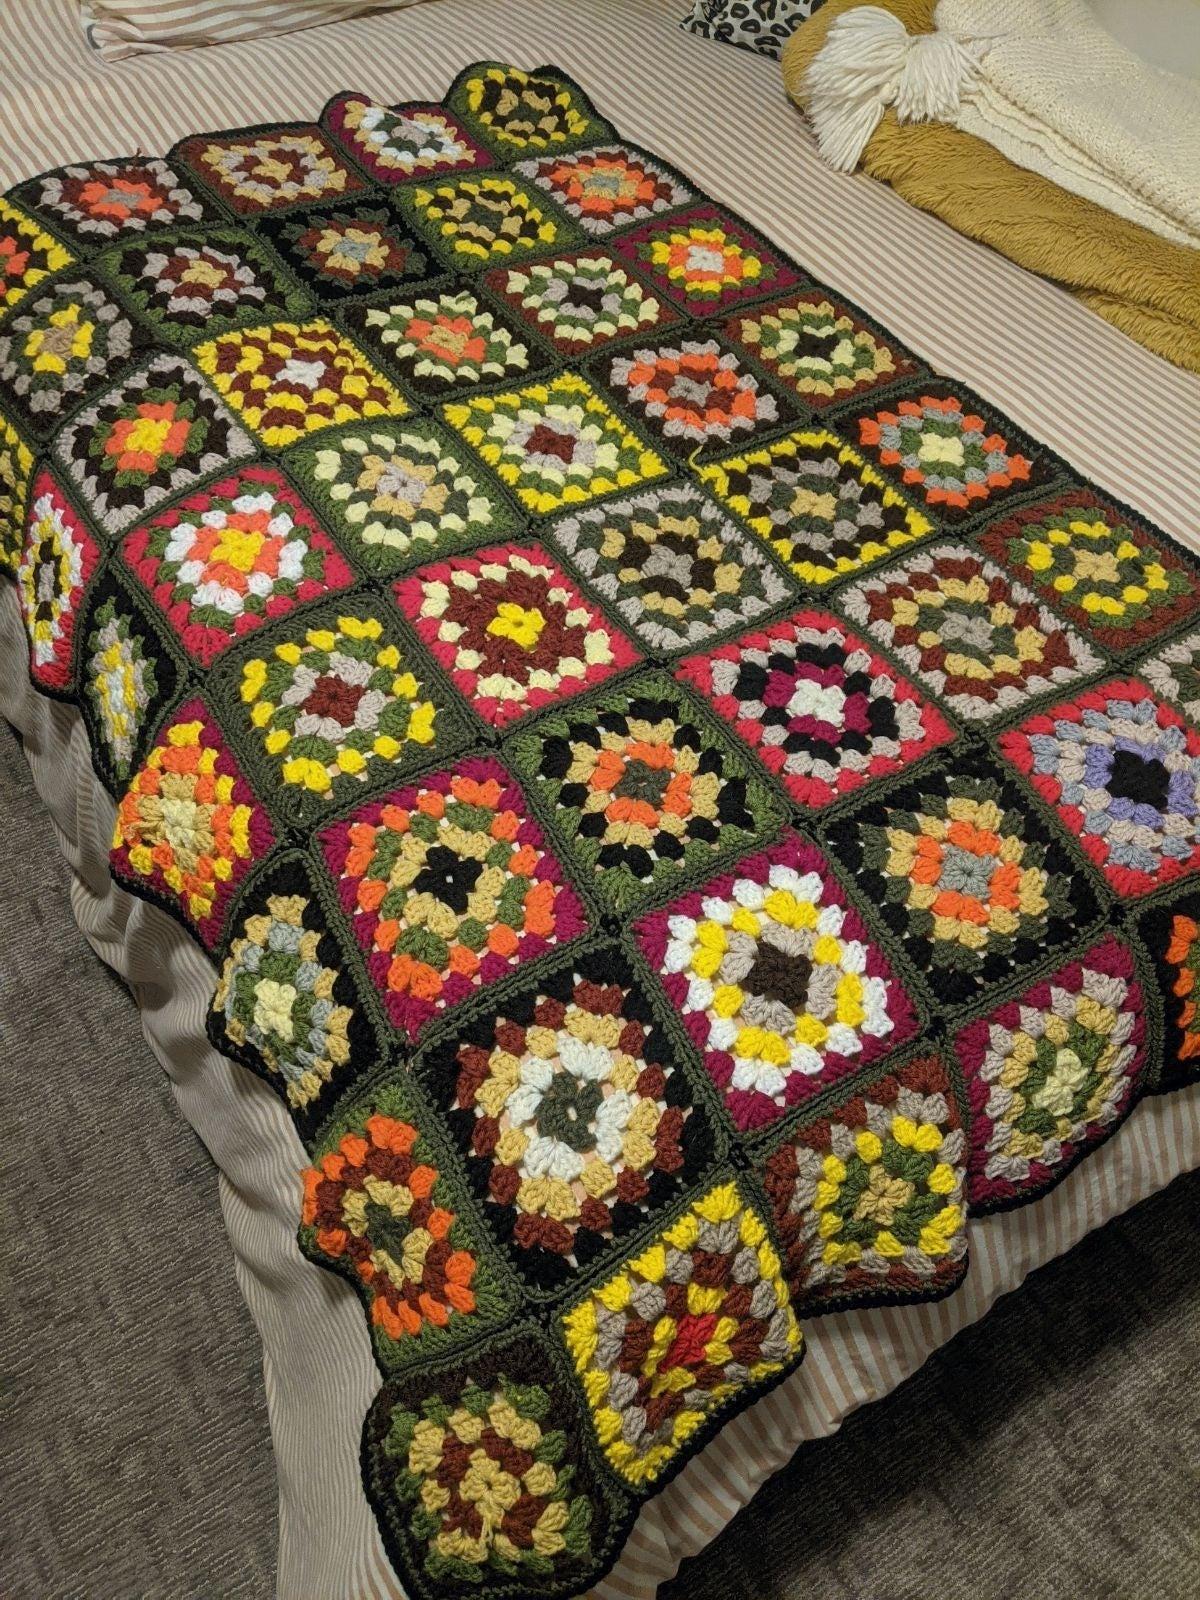 Warm Crocheted Square Handmade Blanket